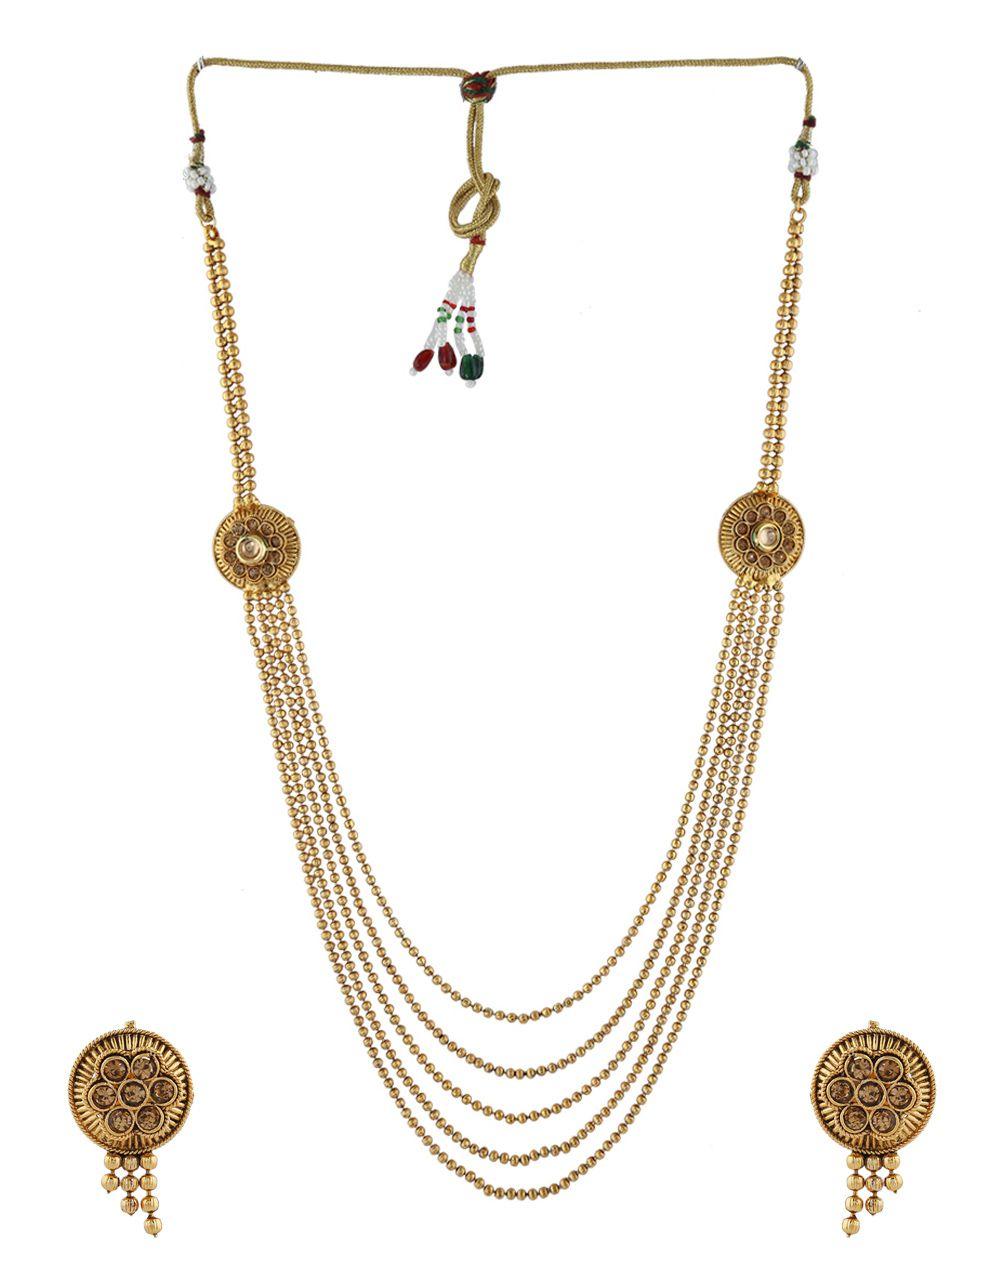 Anuradha Art Gold Finish Golden Beads Styled Wonderful Designer Traditional Long Necklace Set For Women/Girls